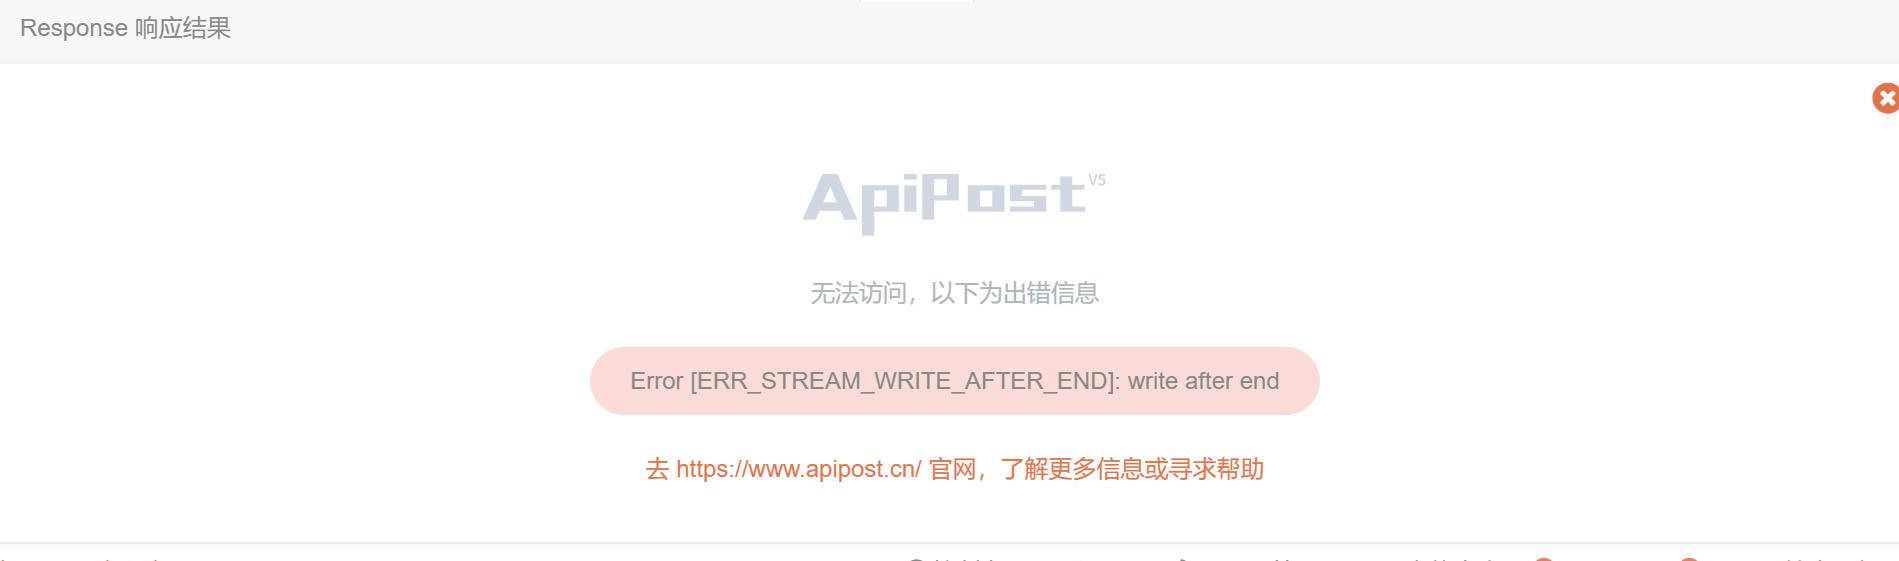 发送请求报错ERR_STREAM_WRITE_AFTER_END